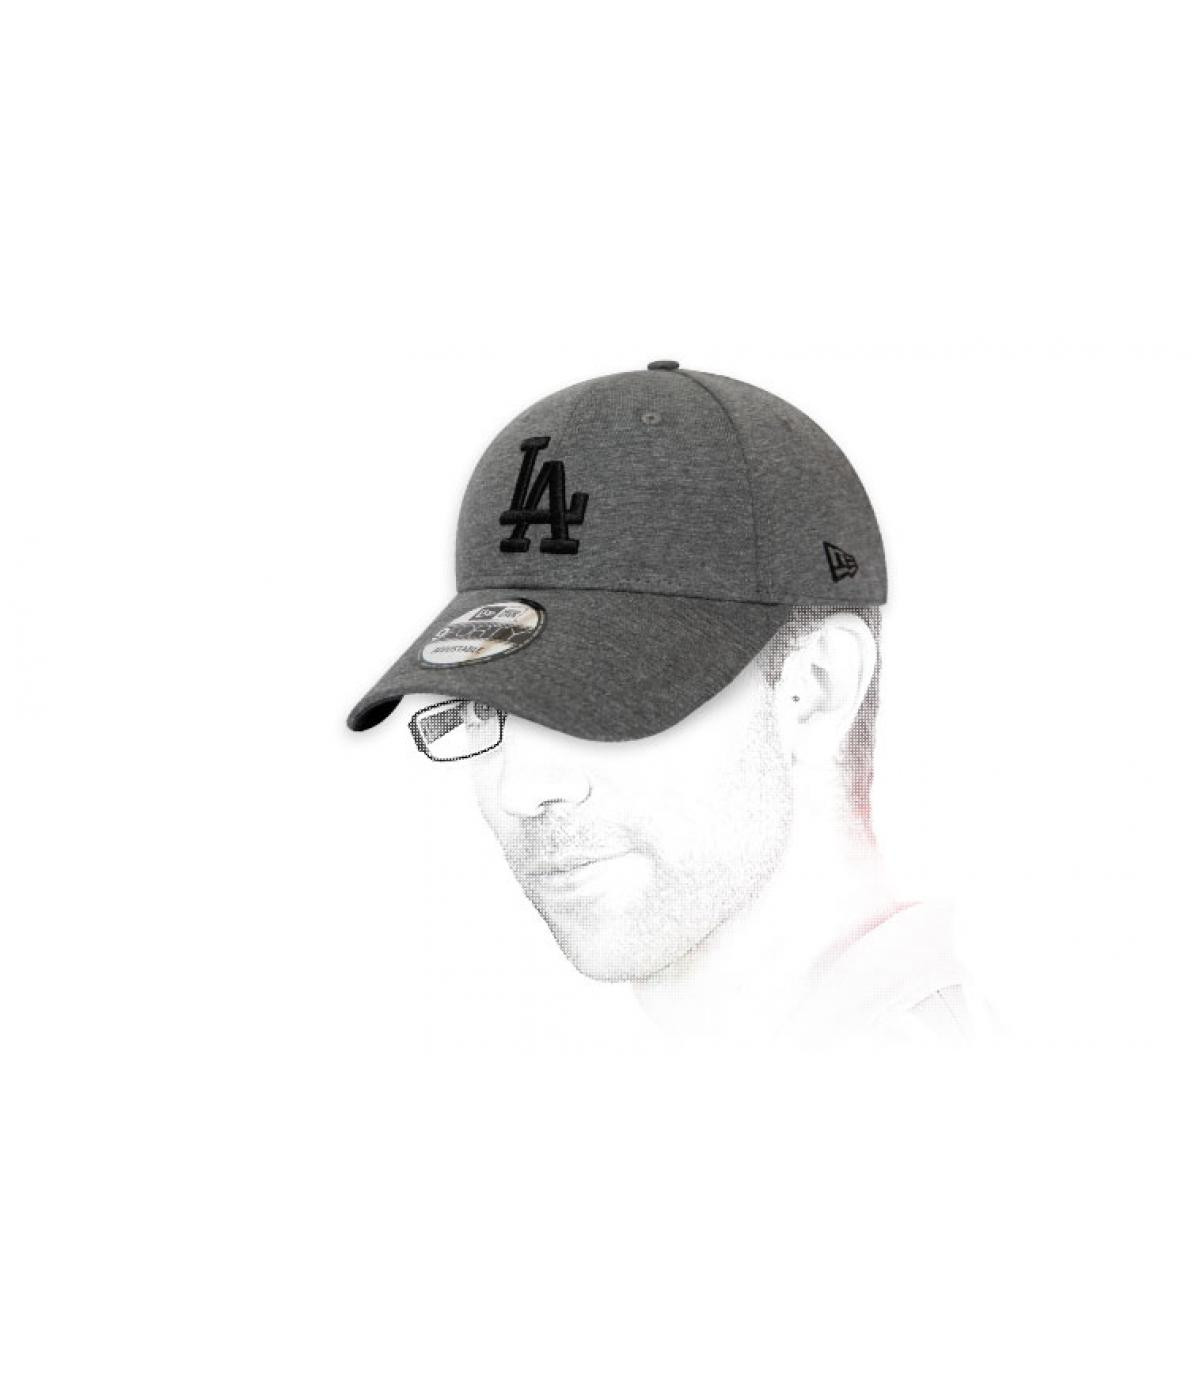 gorra LA gris negro